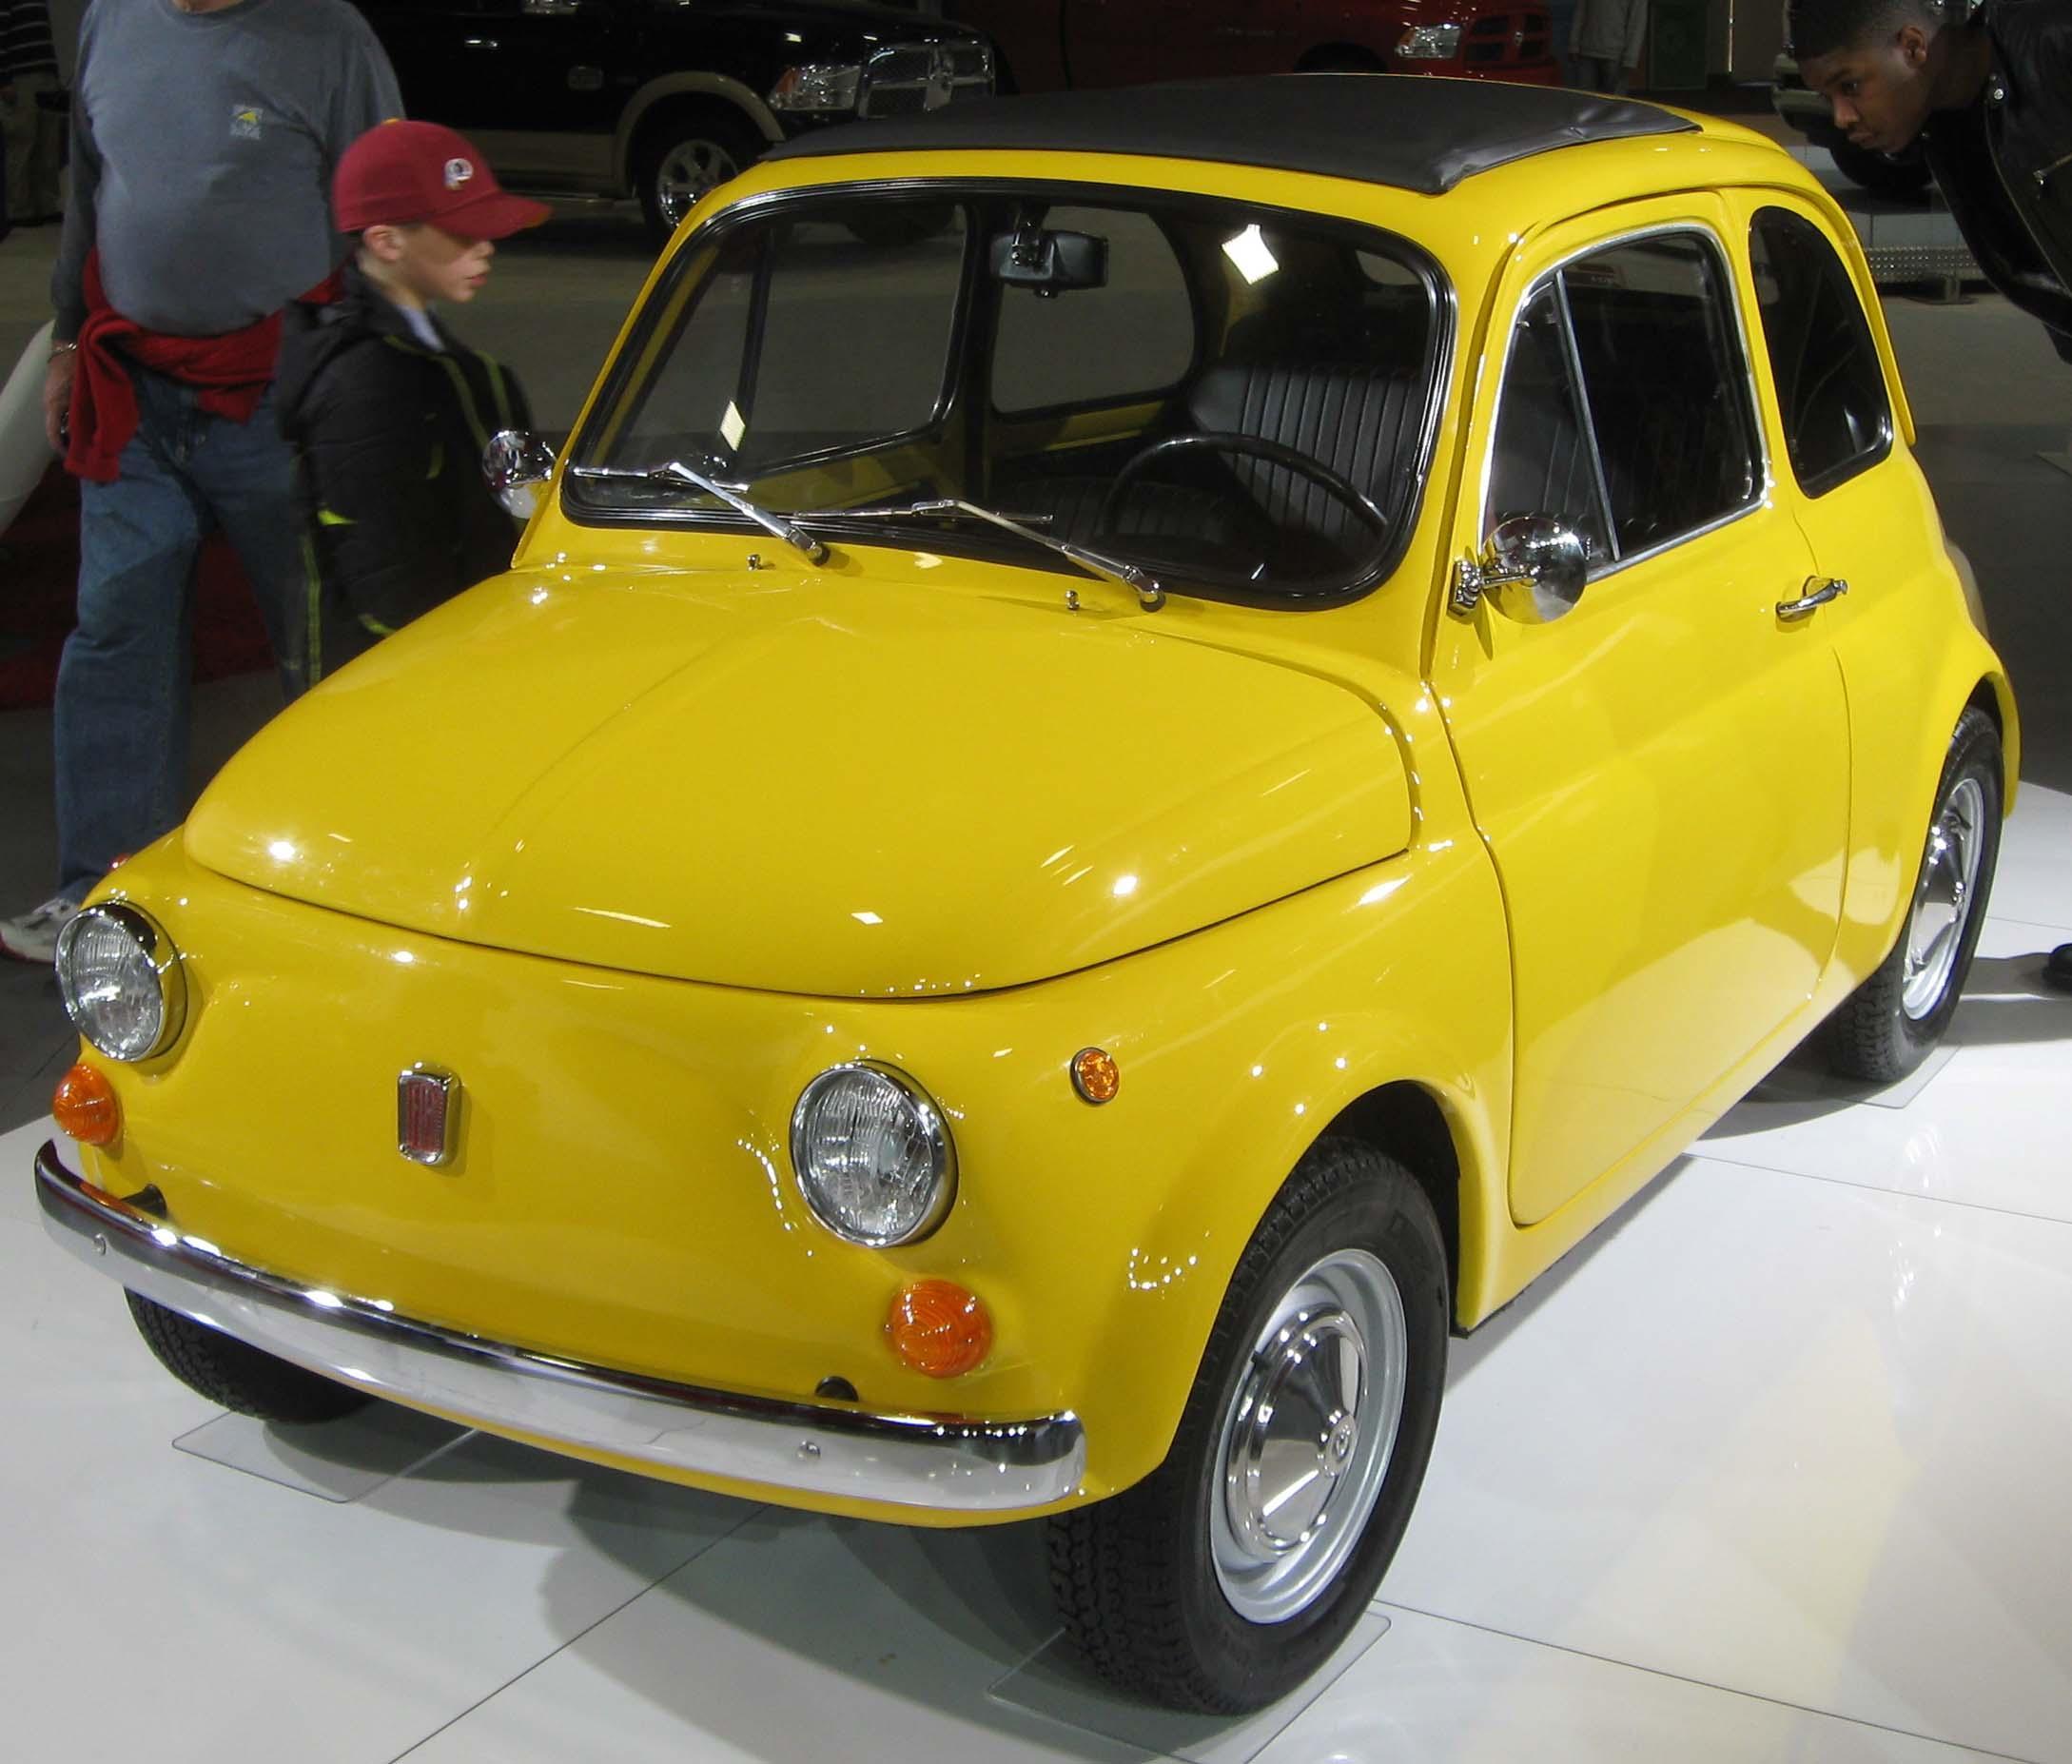 New Fiat 500, A World-class Small Car